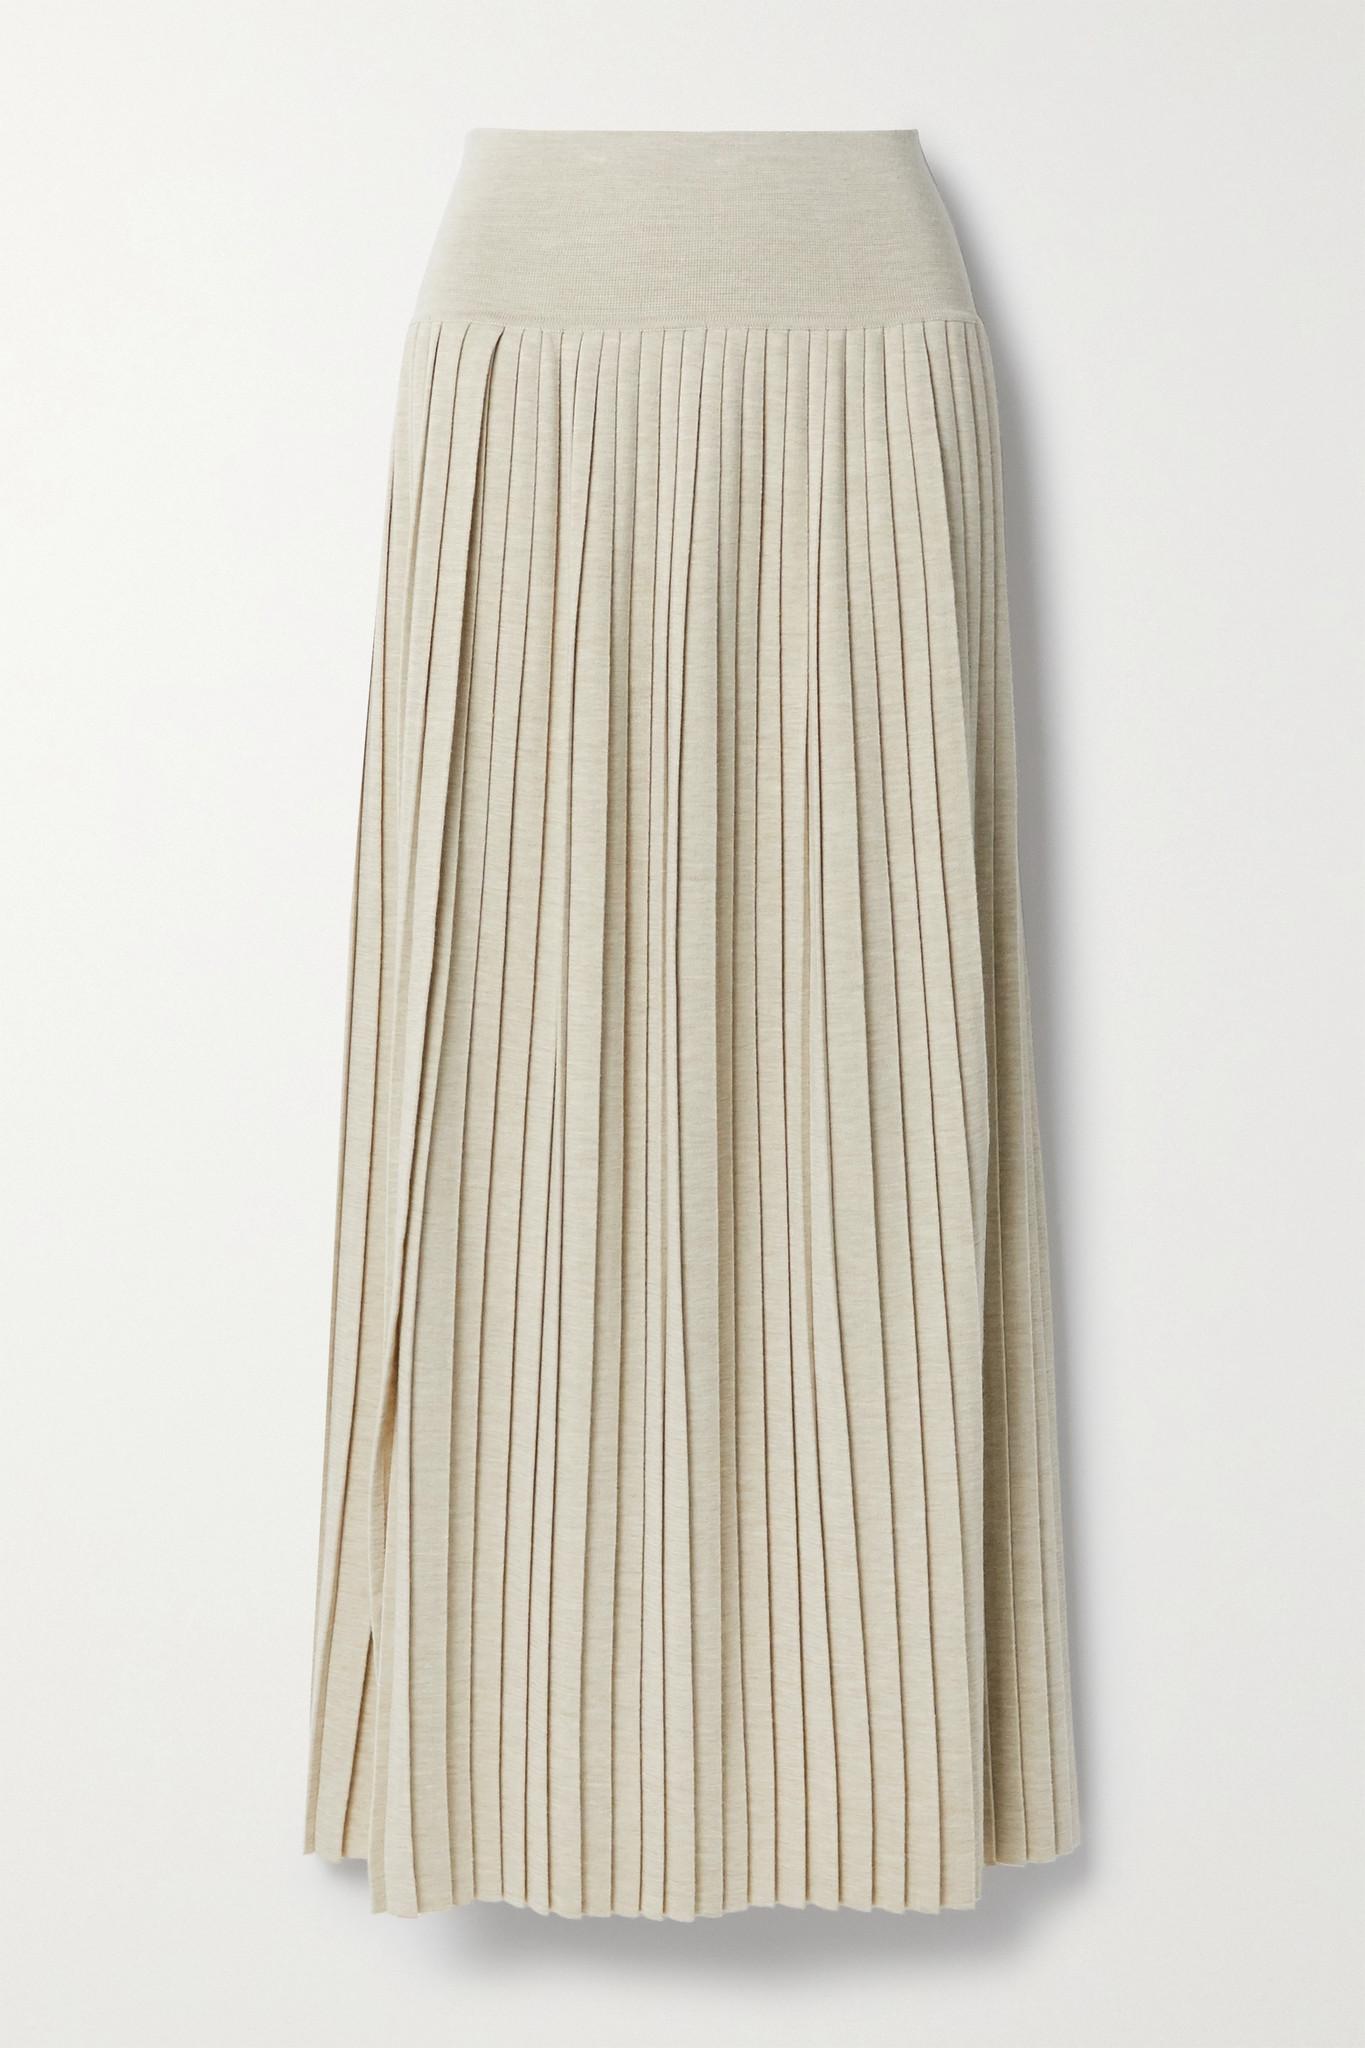 THE ROW - Coraline 褶裥羊毛真丝混纺超长半身裙 - 中性色 - medium